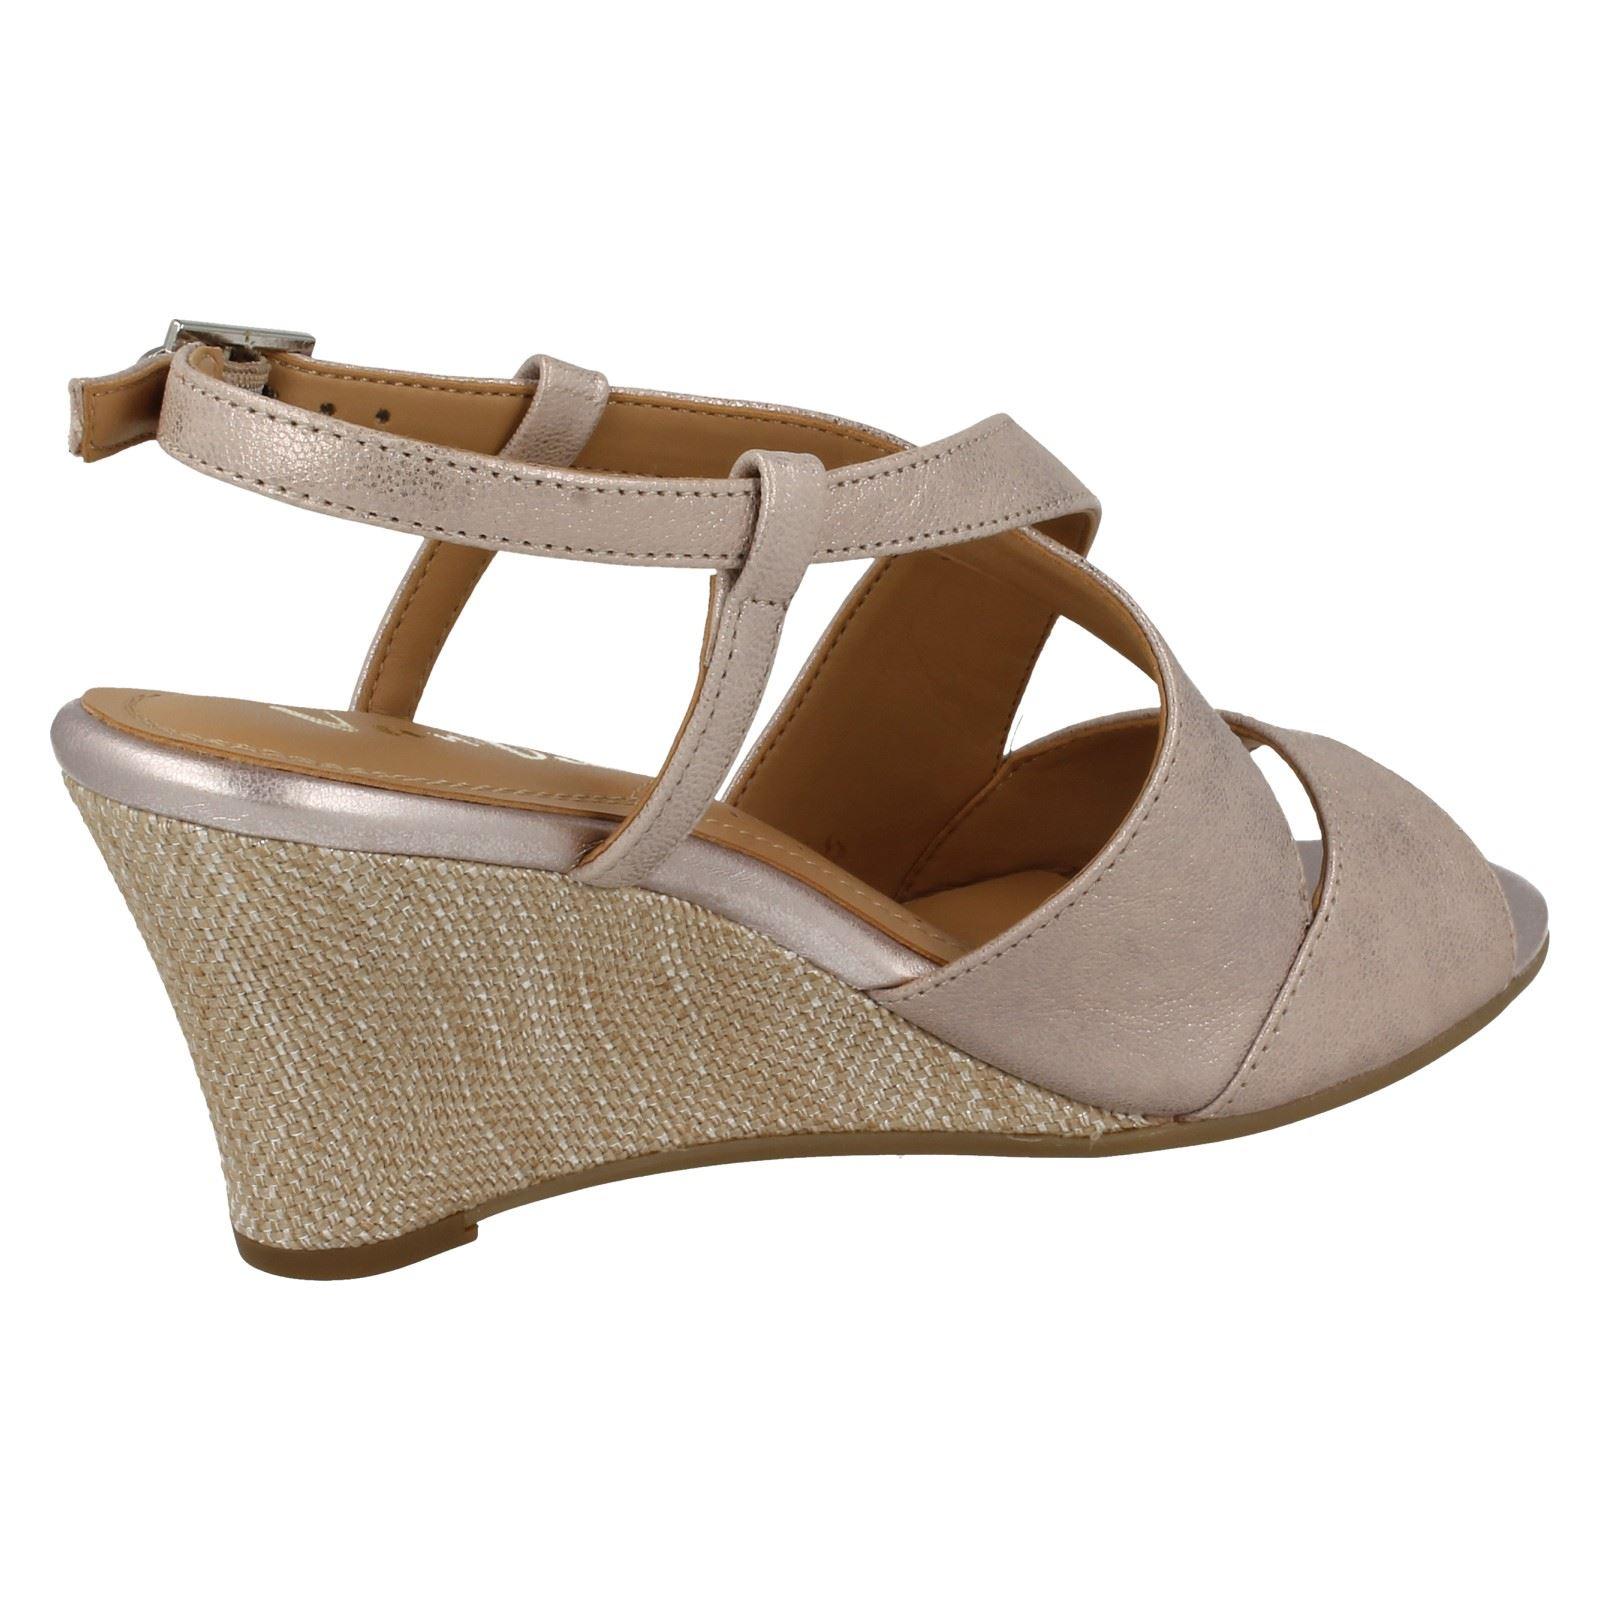 Ladies-Van-Dal-Cross-Strap-Wedged-Sandal-Allora thumbnail 10